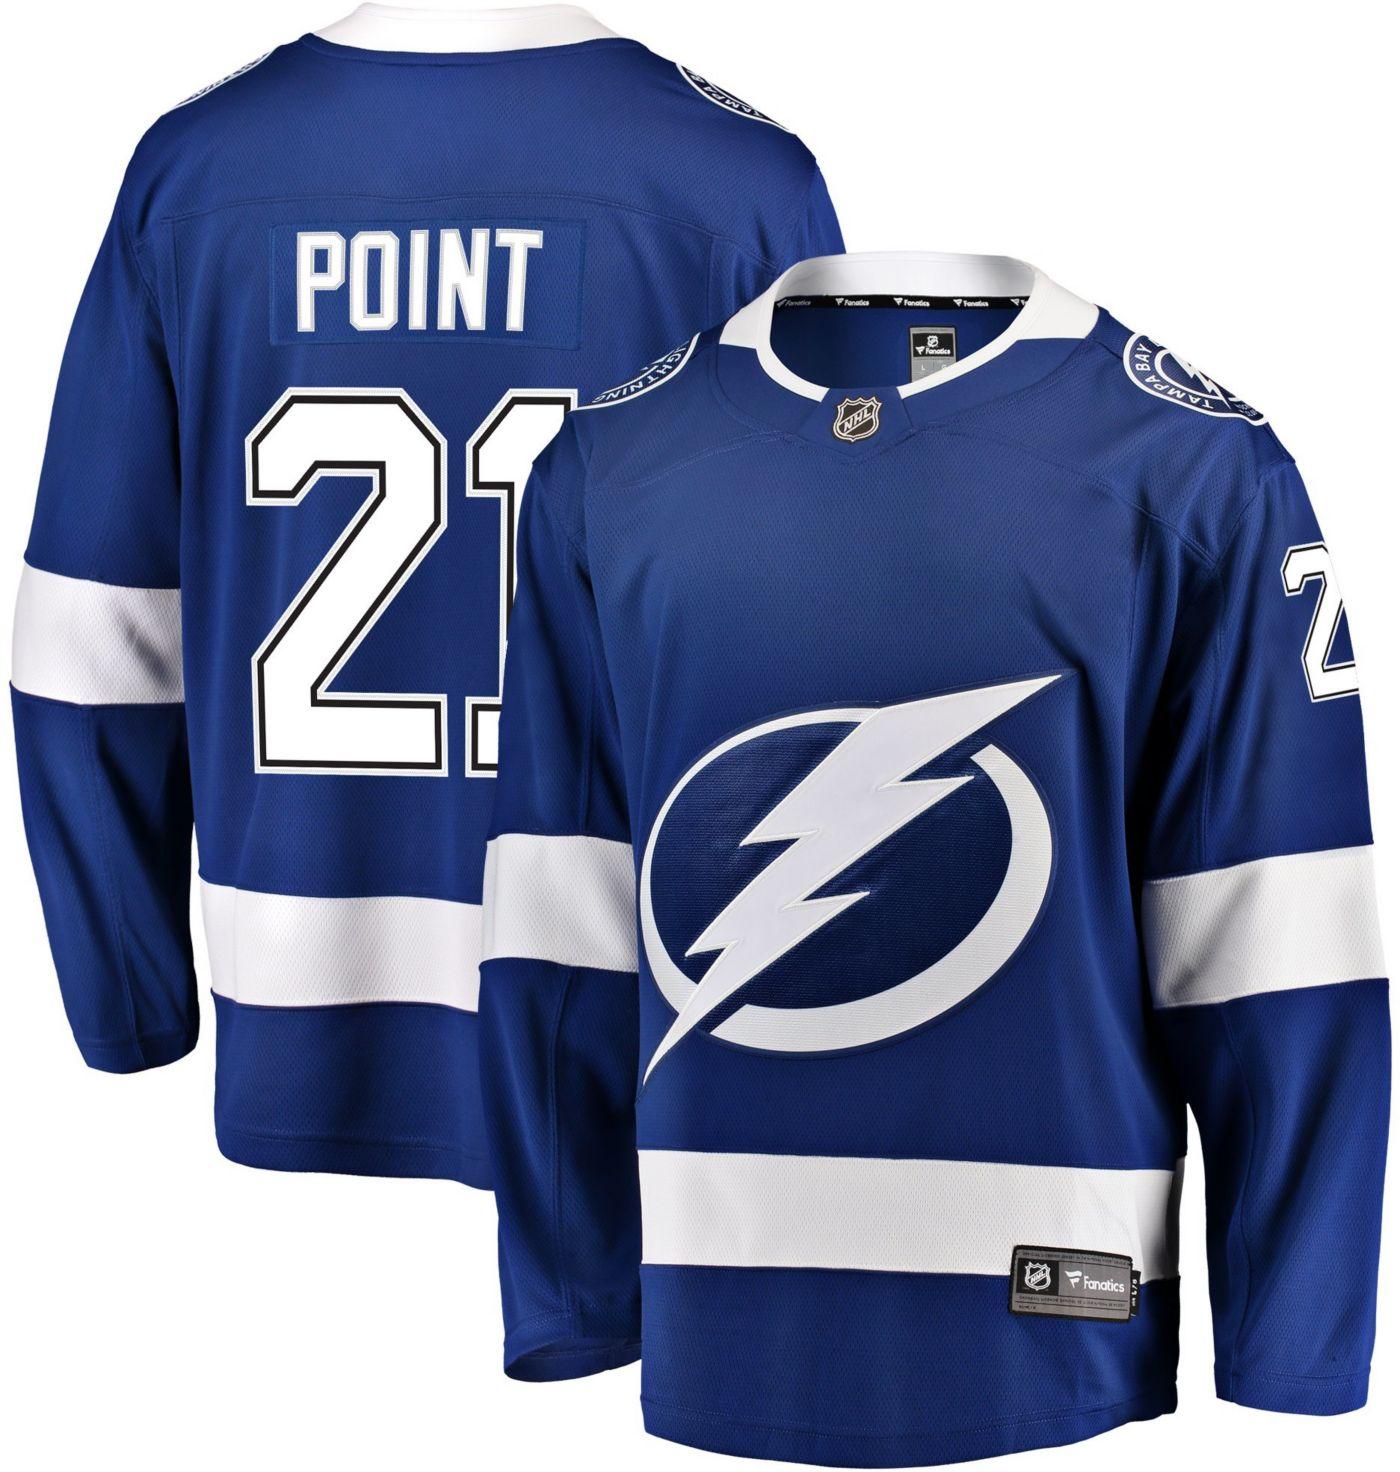 NHL Men's Tampa Bay Lightning Brayden Point #21 Breakaway Home Replica Jersey